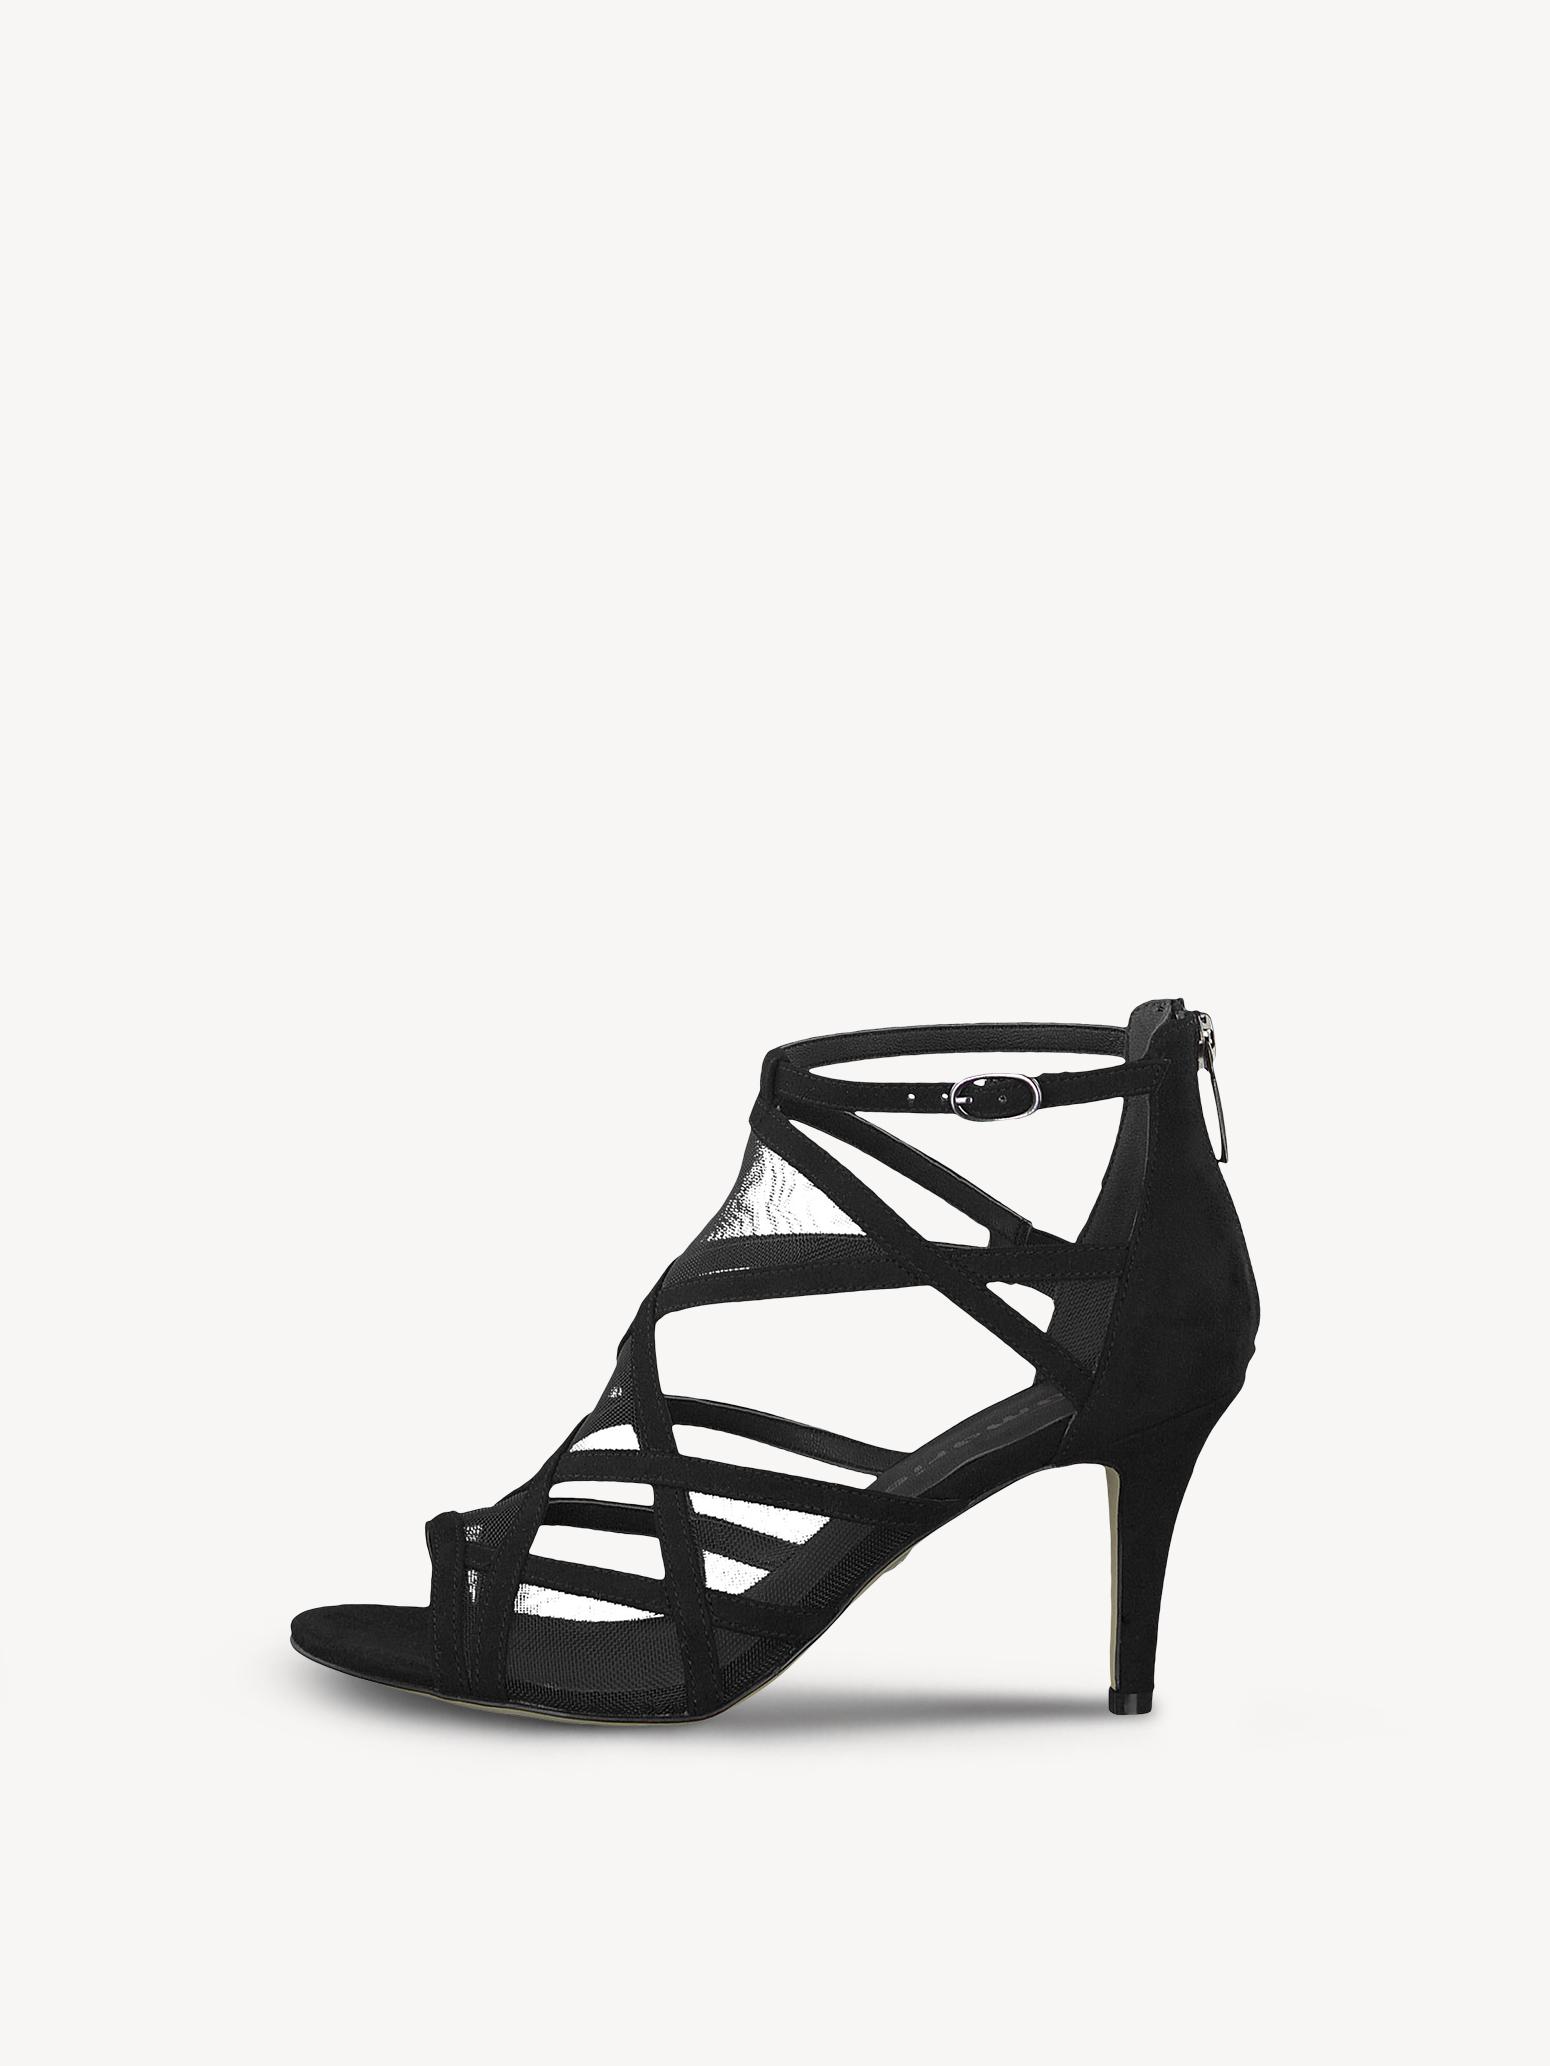 491cb5756a2 Heiti 1-1-28003-22  Buy Tamaris Heeled sandals online!